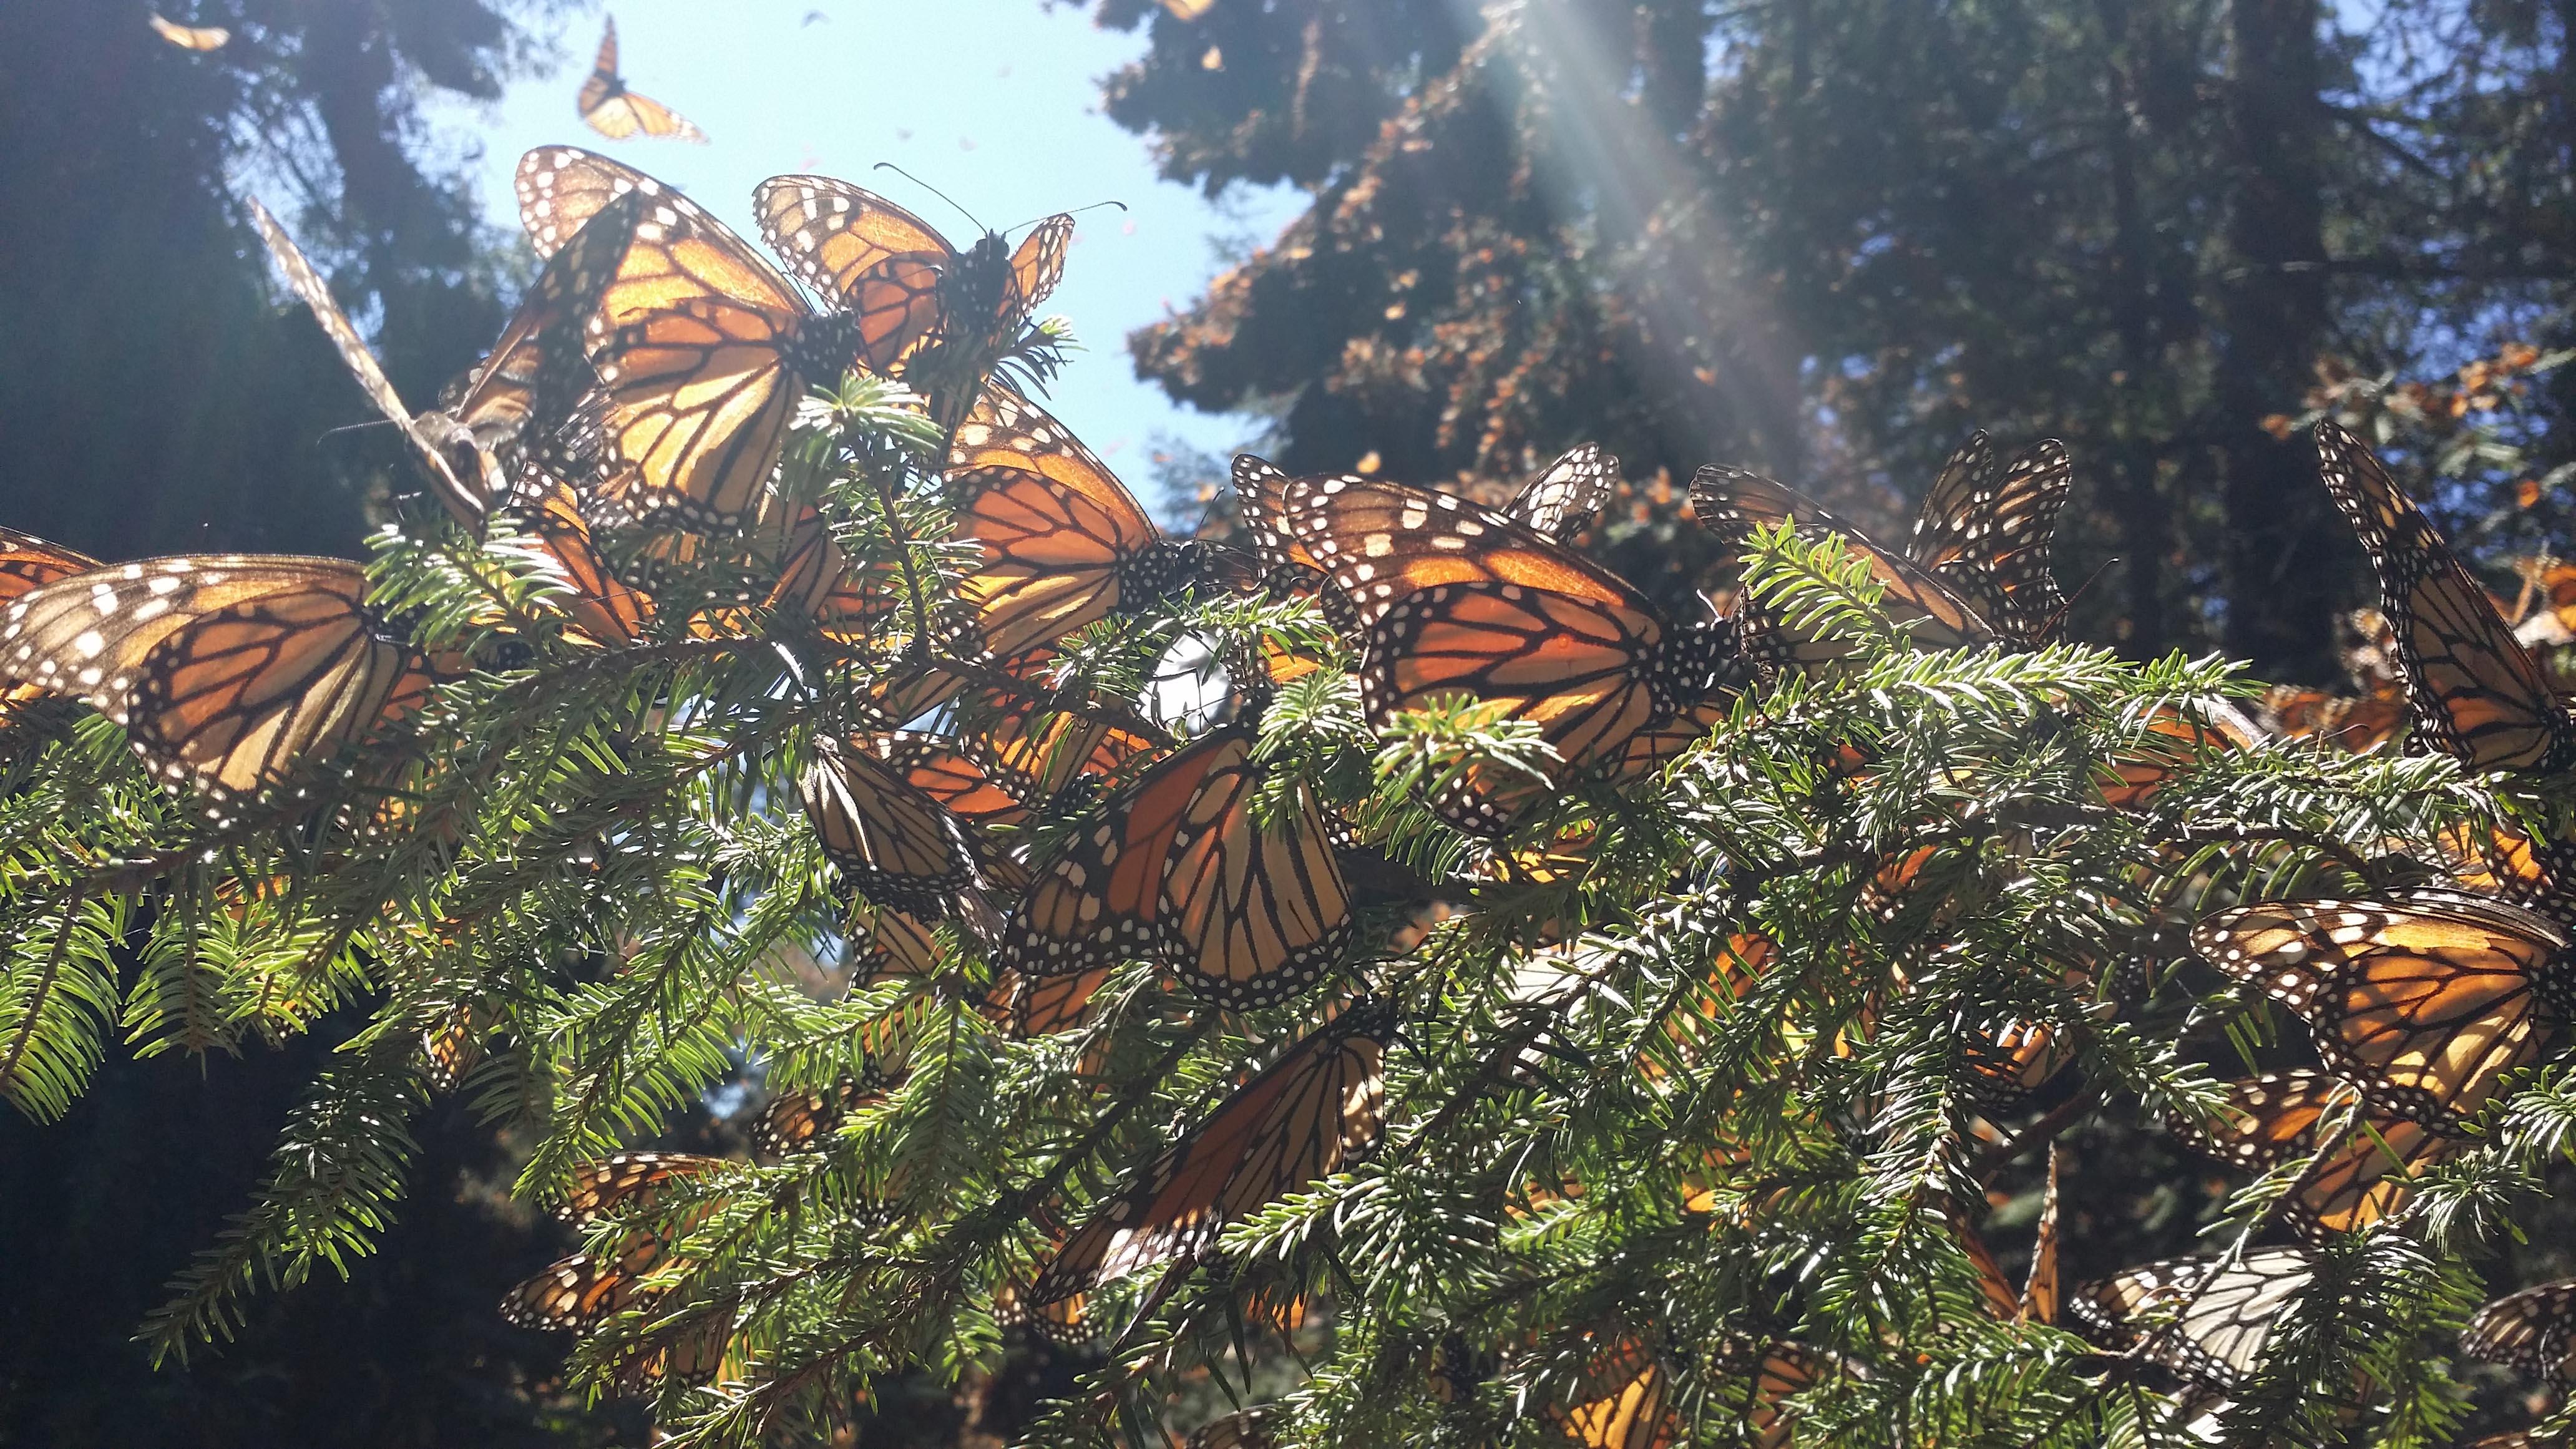 Crece 144% población de mariposas monarcas, pero aún continúan en riesgo